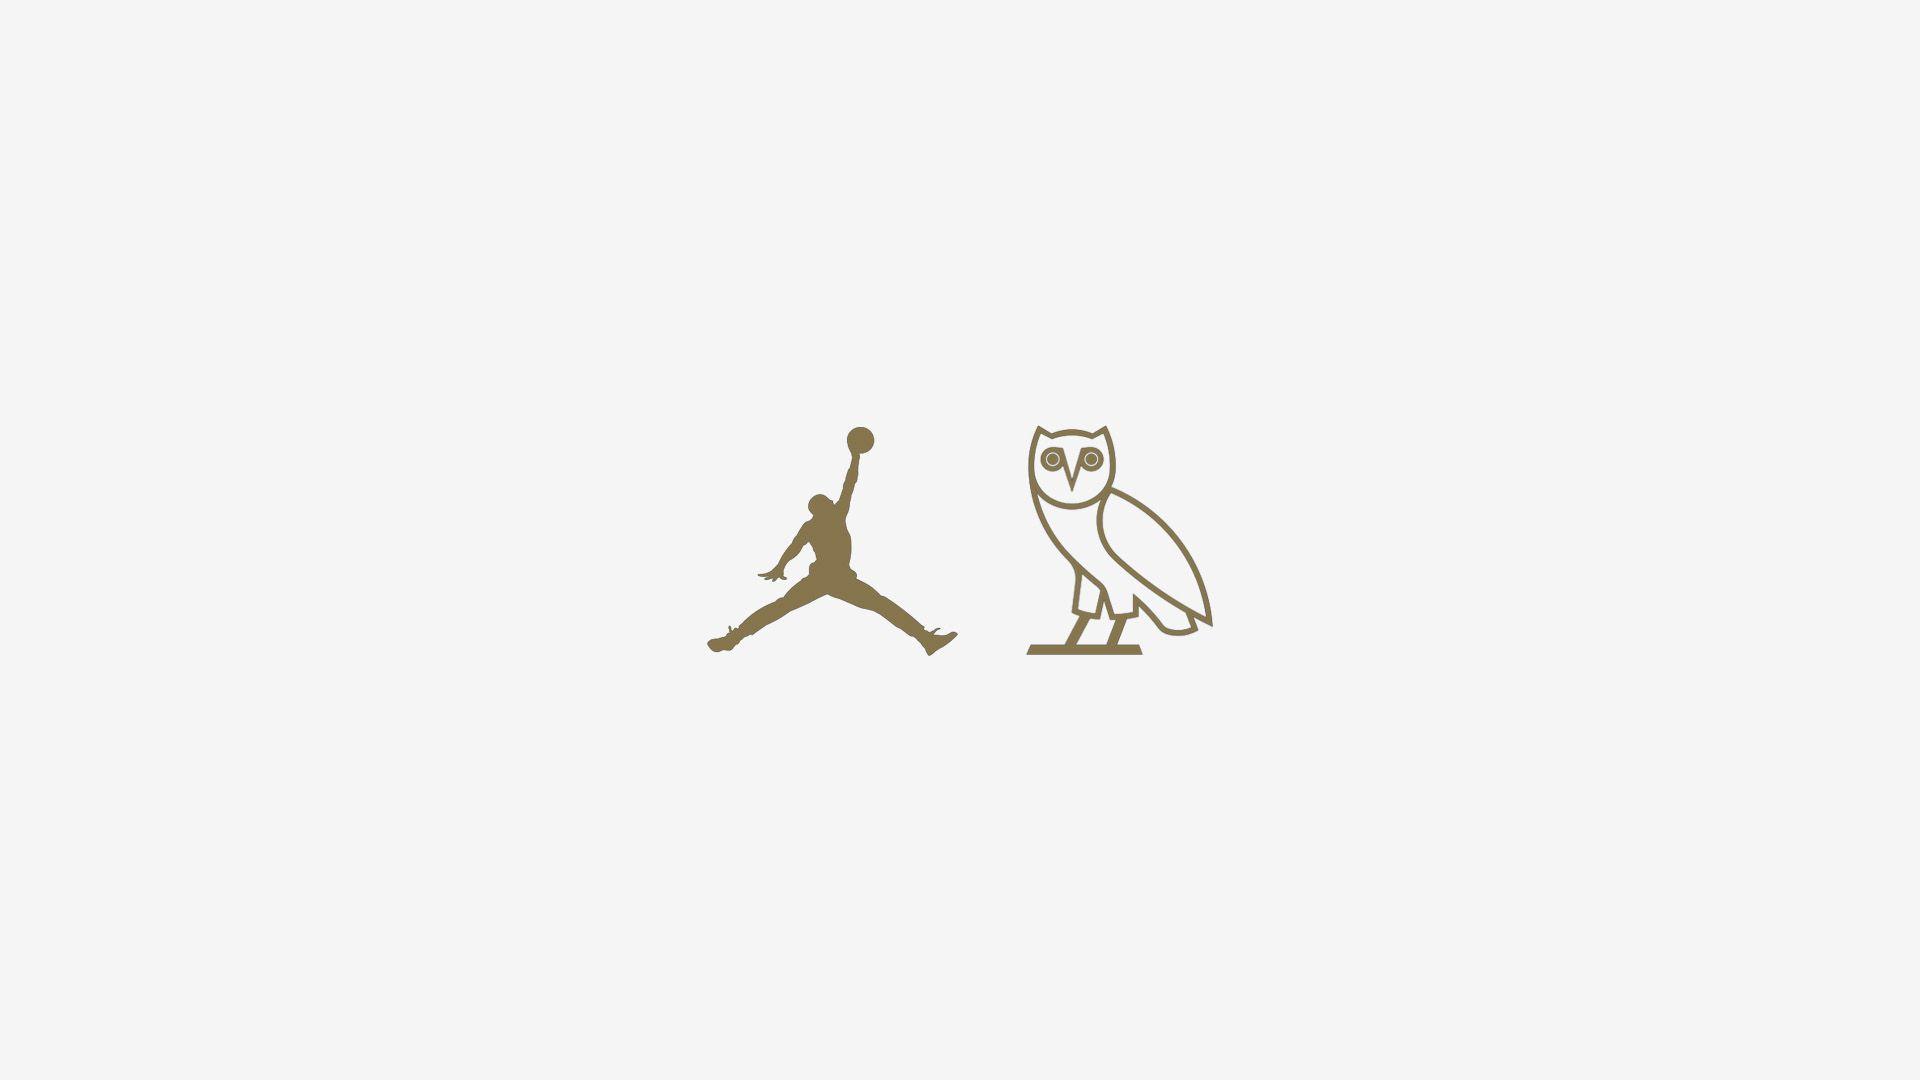 official photos abb69 d7131 Air Jordan 12 OVO  White   Metallic Gold  Release Date